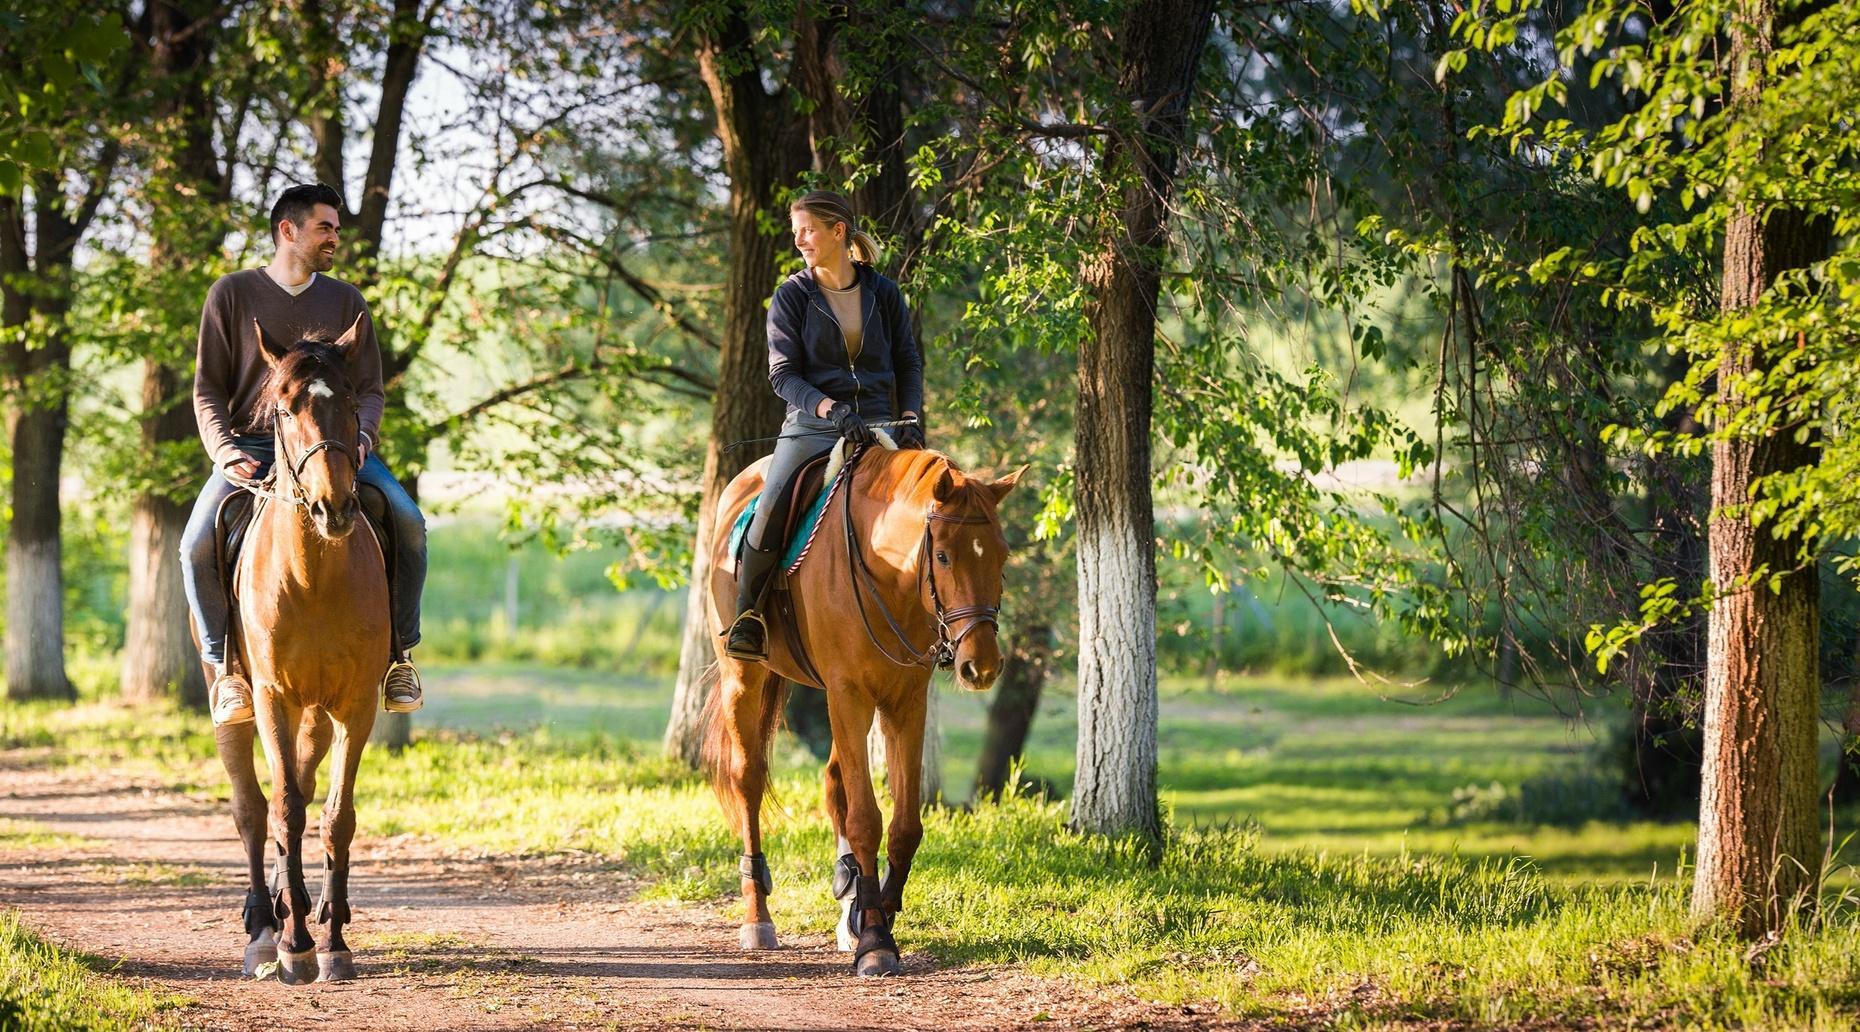 Zuma Canyon Group Horseback Ride in Agoura Hills